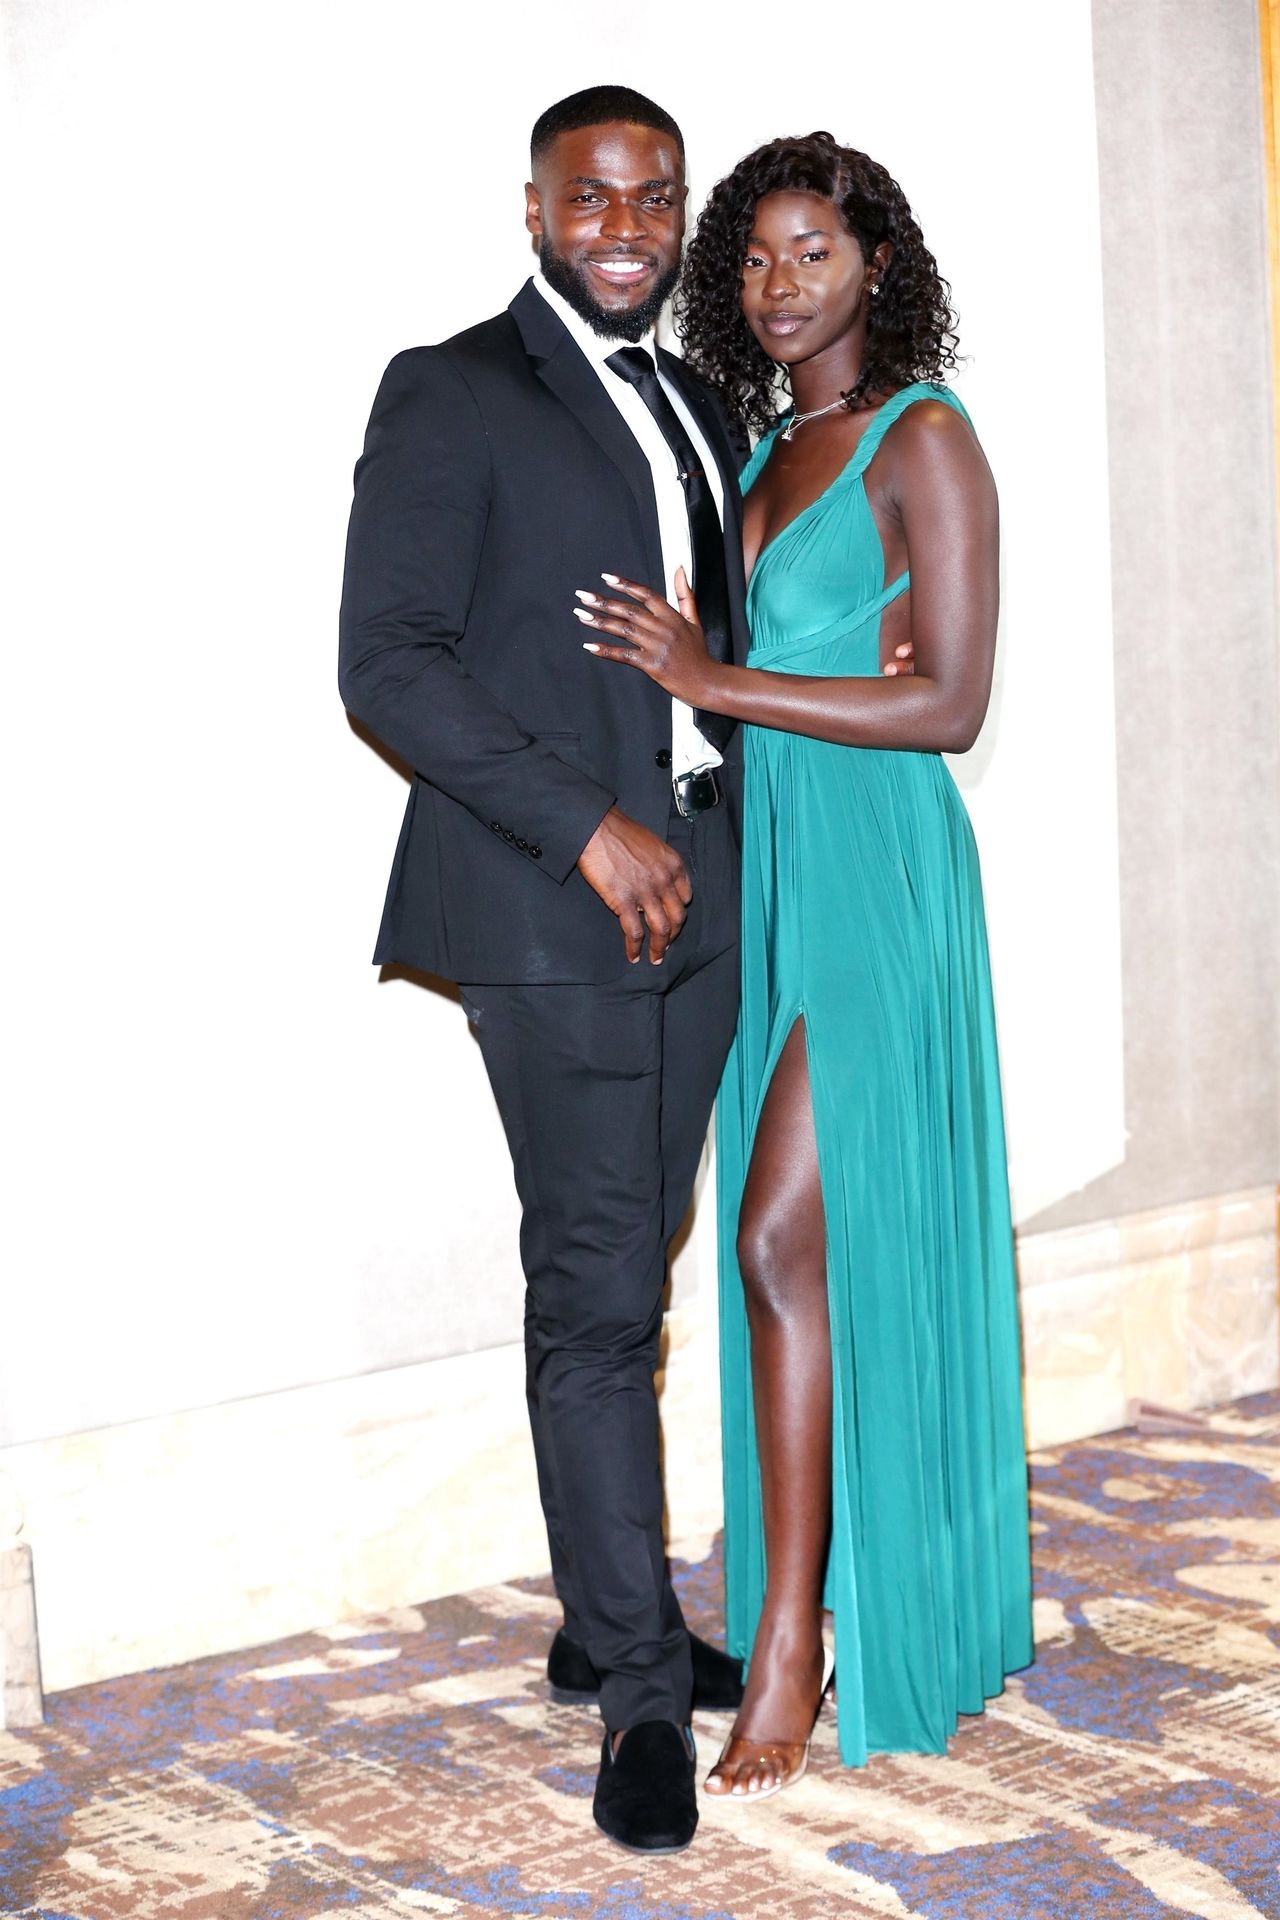 Mike Boateng & Priscilla Anyabu Are Seen At British Ethnic Diversity Sports Awards 0123